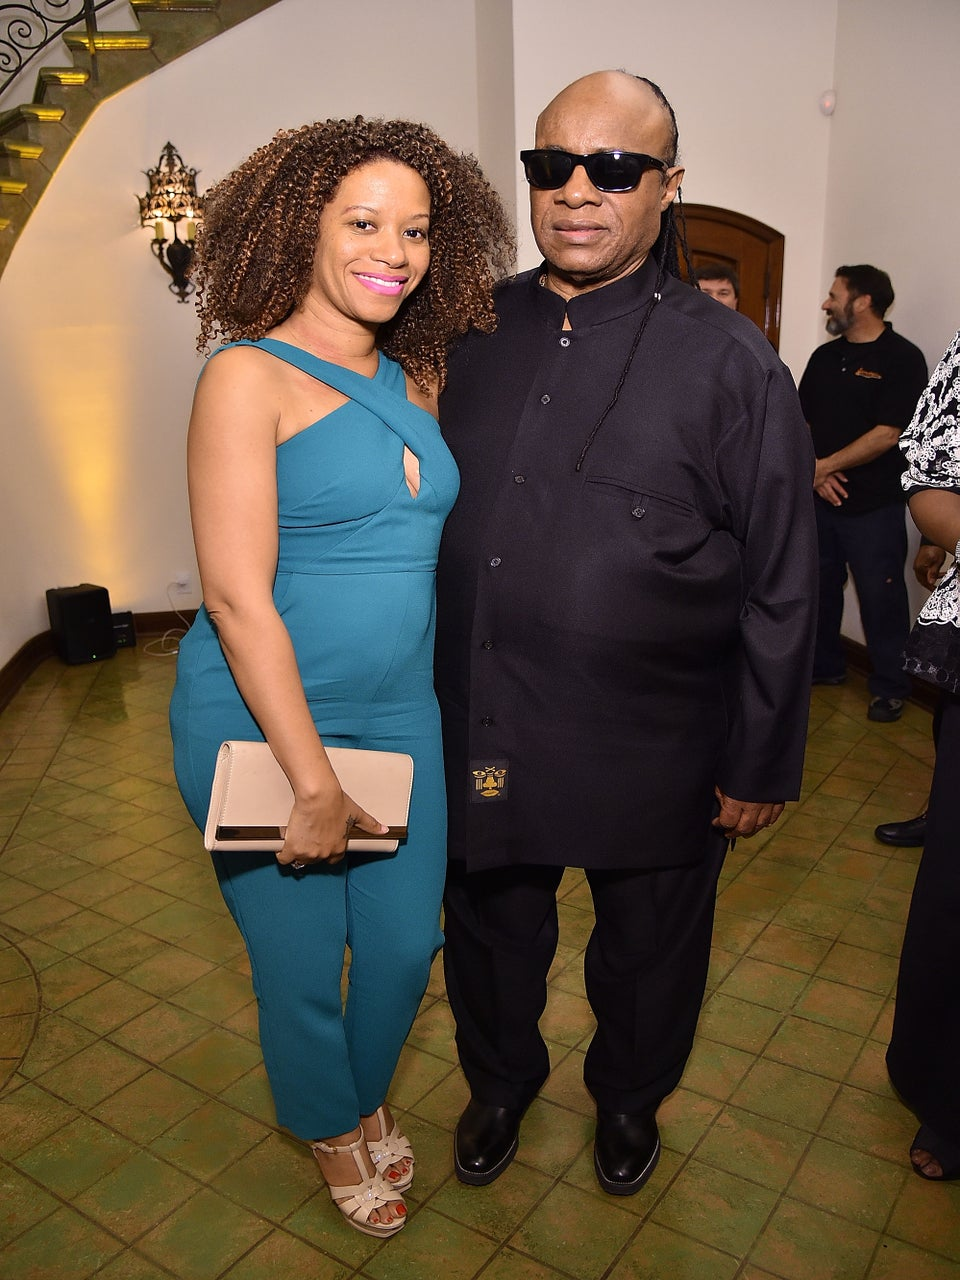 Stevie Wonder And Tomeeka Bracy To Wed In Jamaica